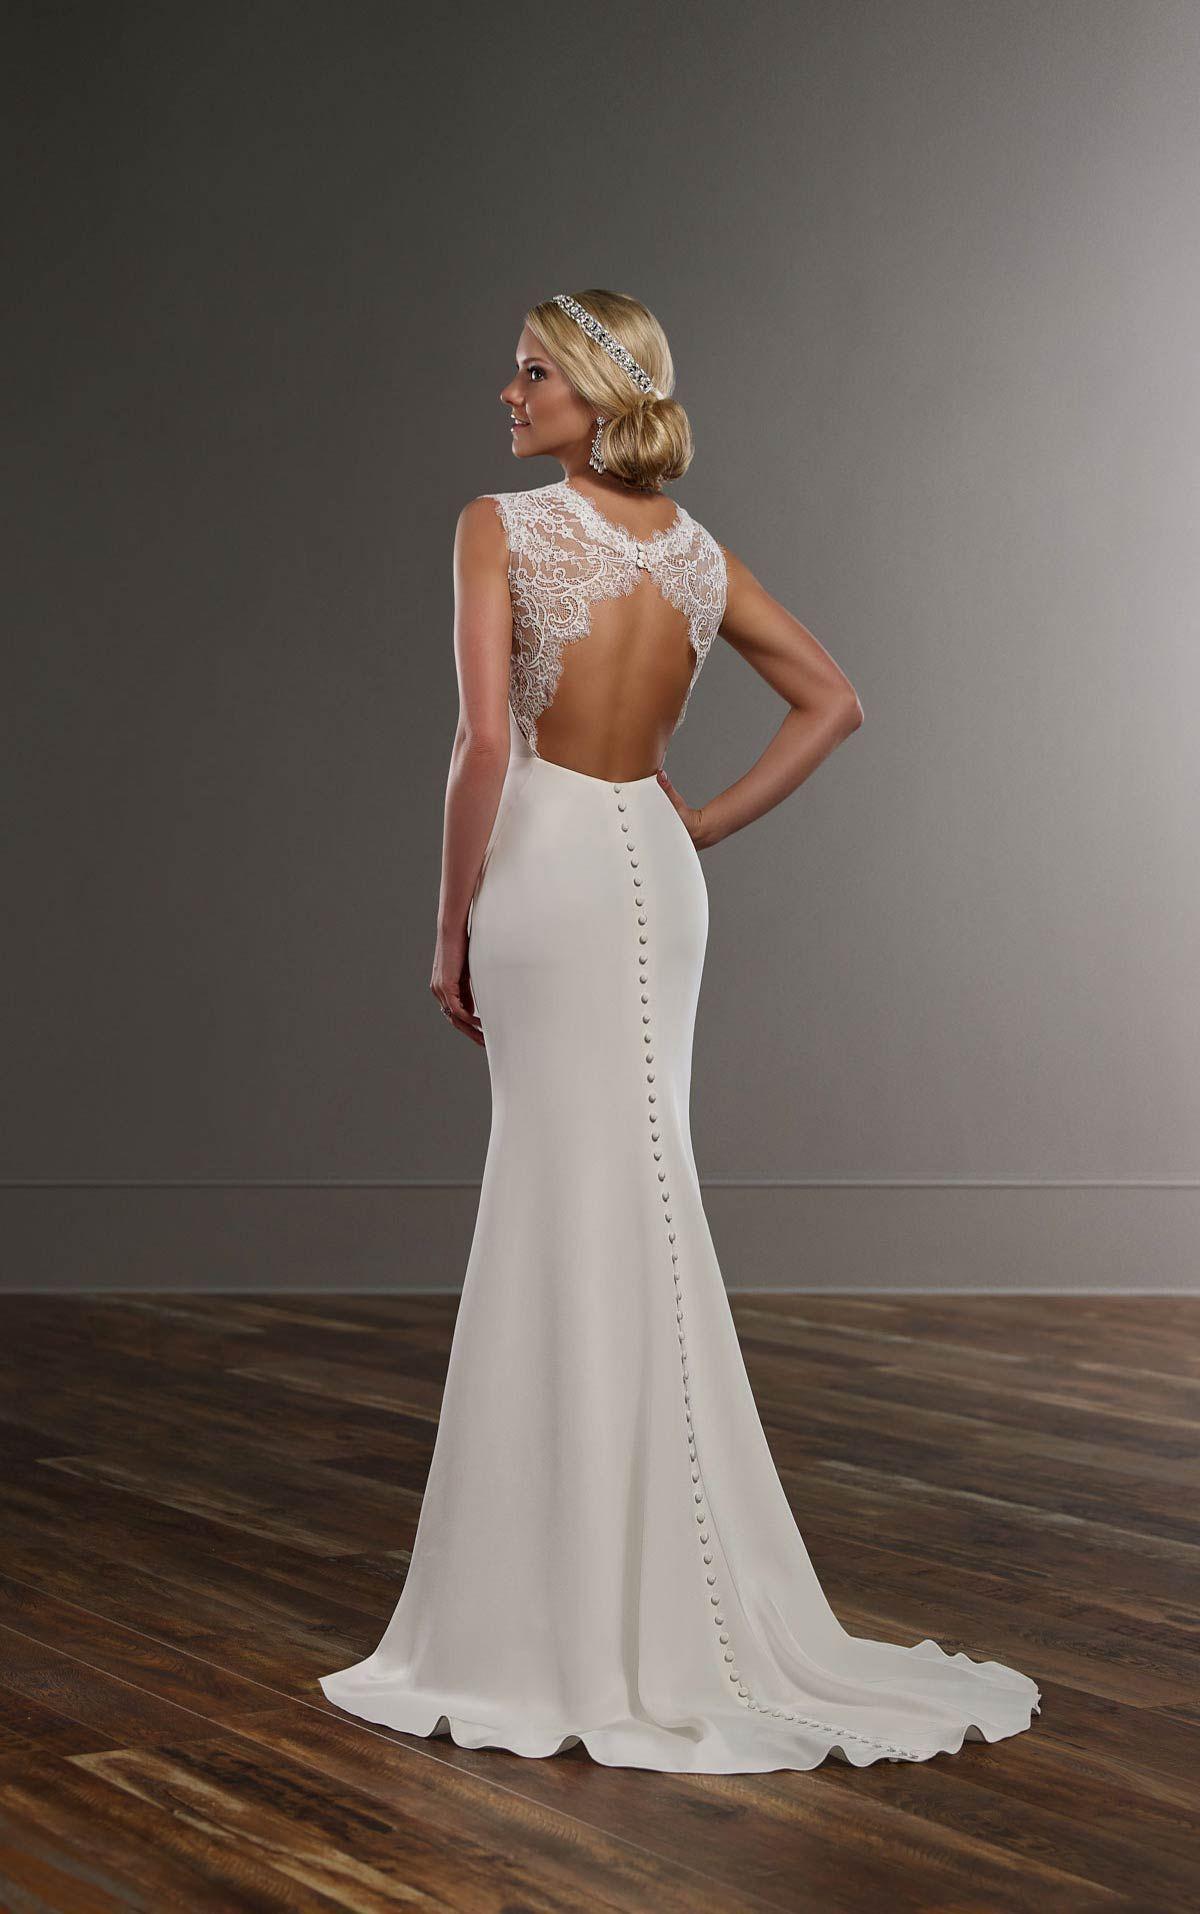 Covered shoulder wedding dresses  Mermaid Wedding Dress by  Wedding Sleeve and Sexy wedding gowns